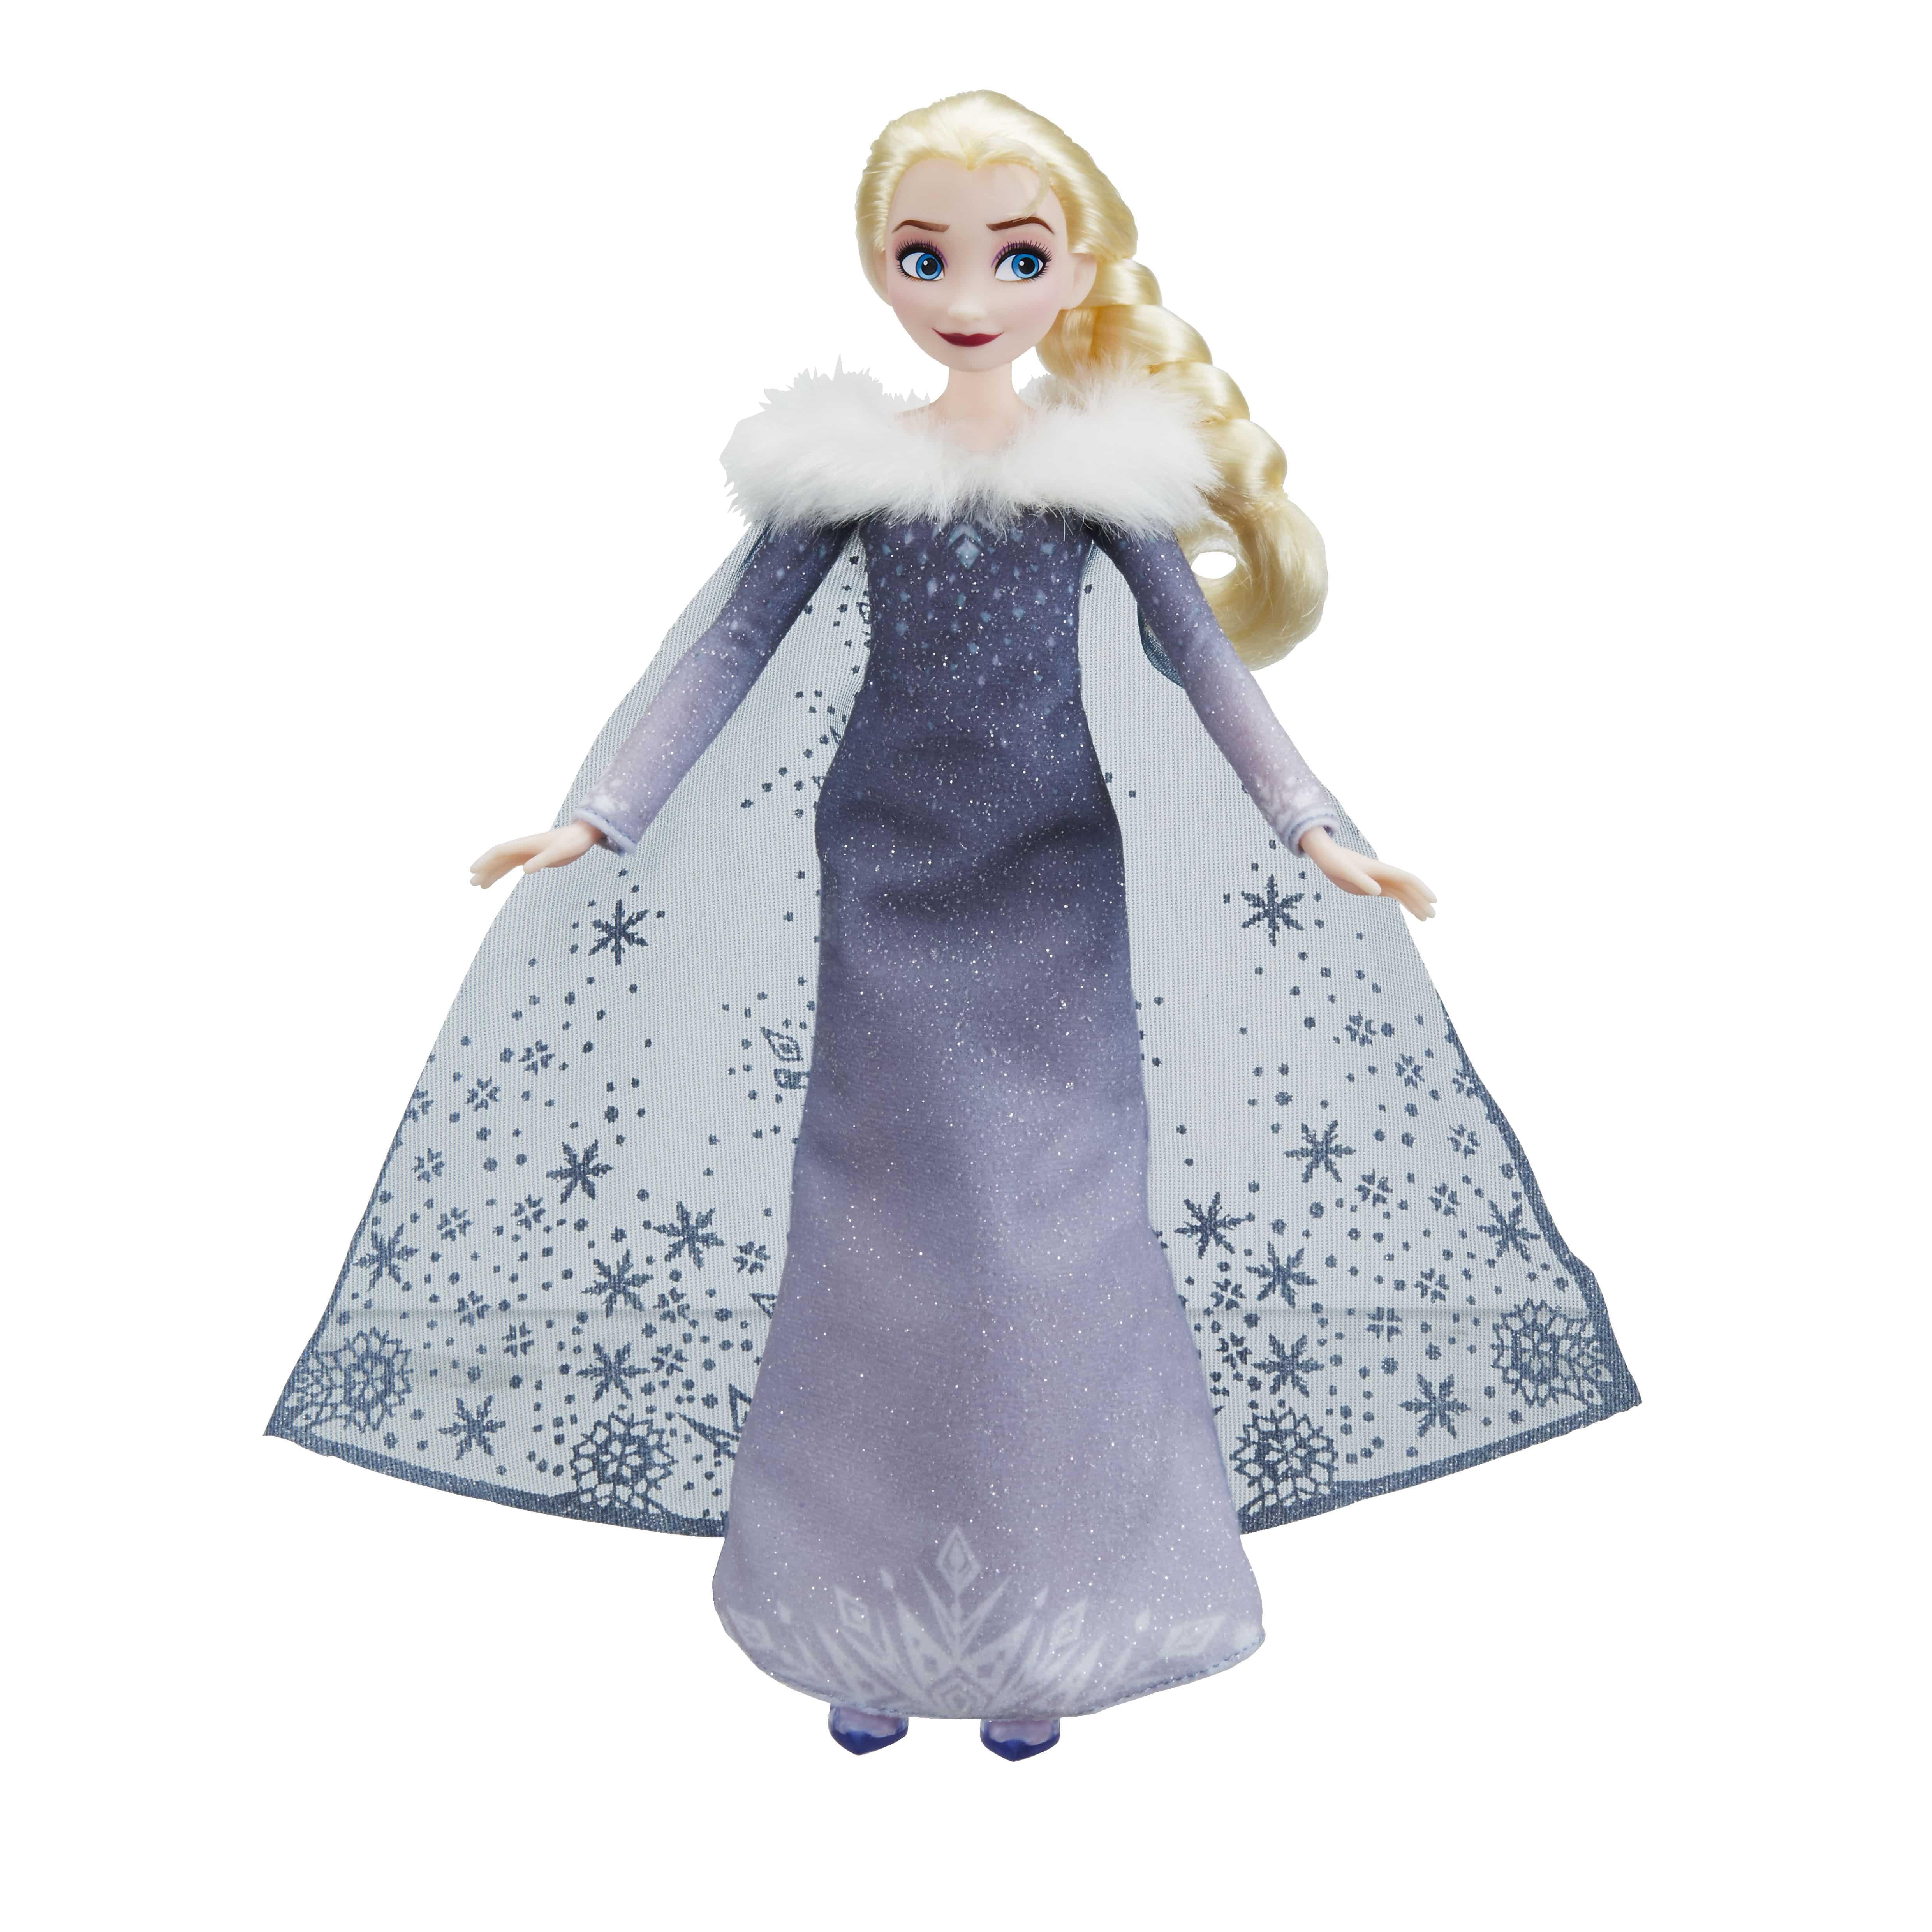 Musical Elsa Doll